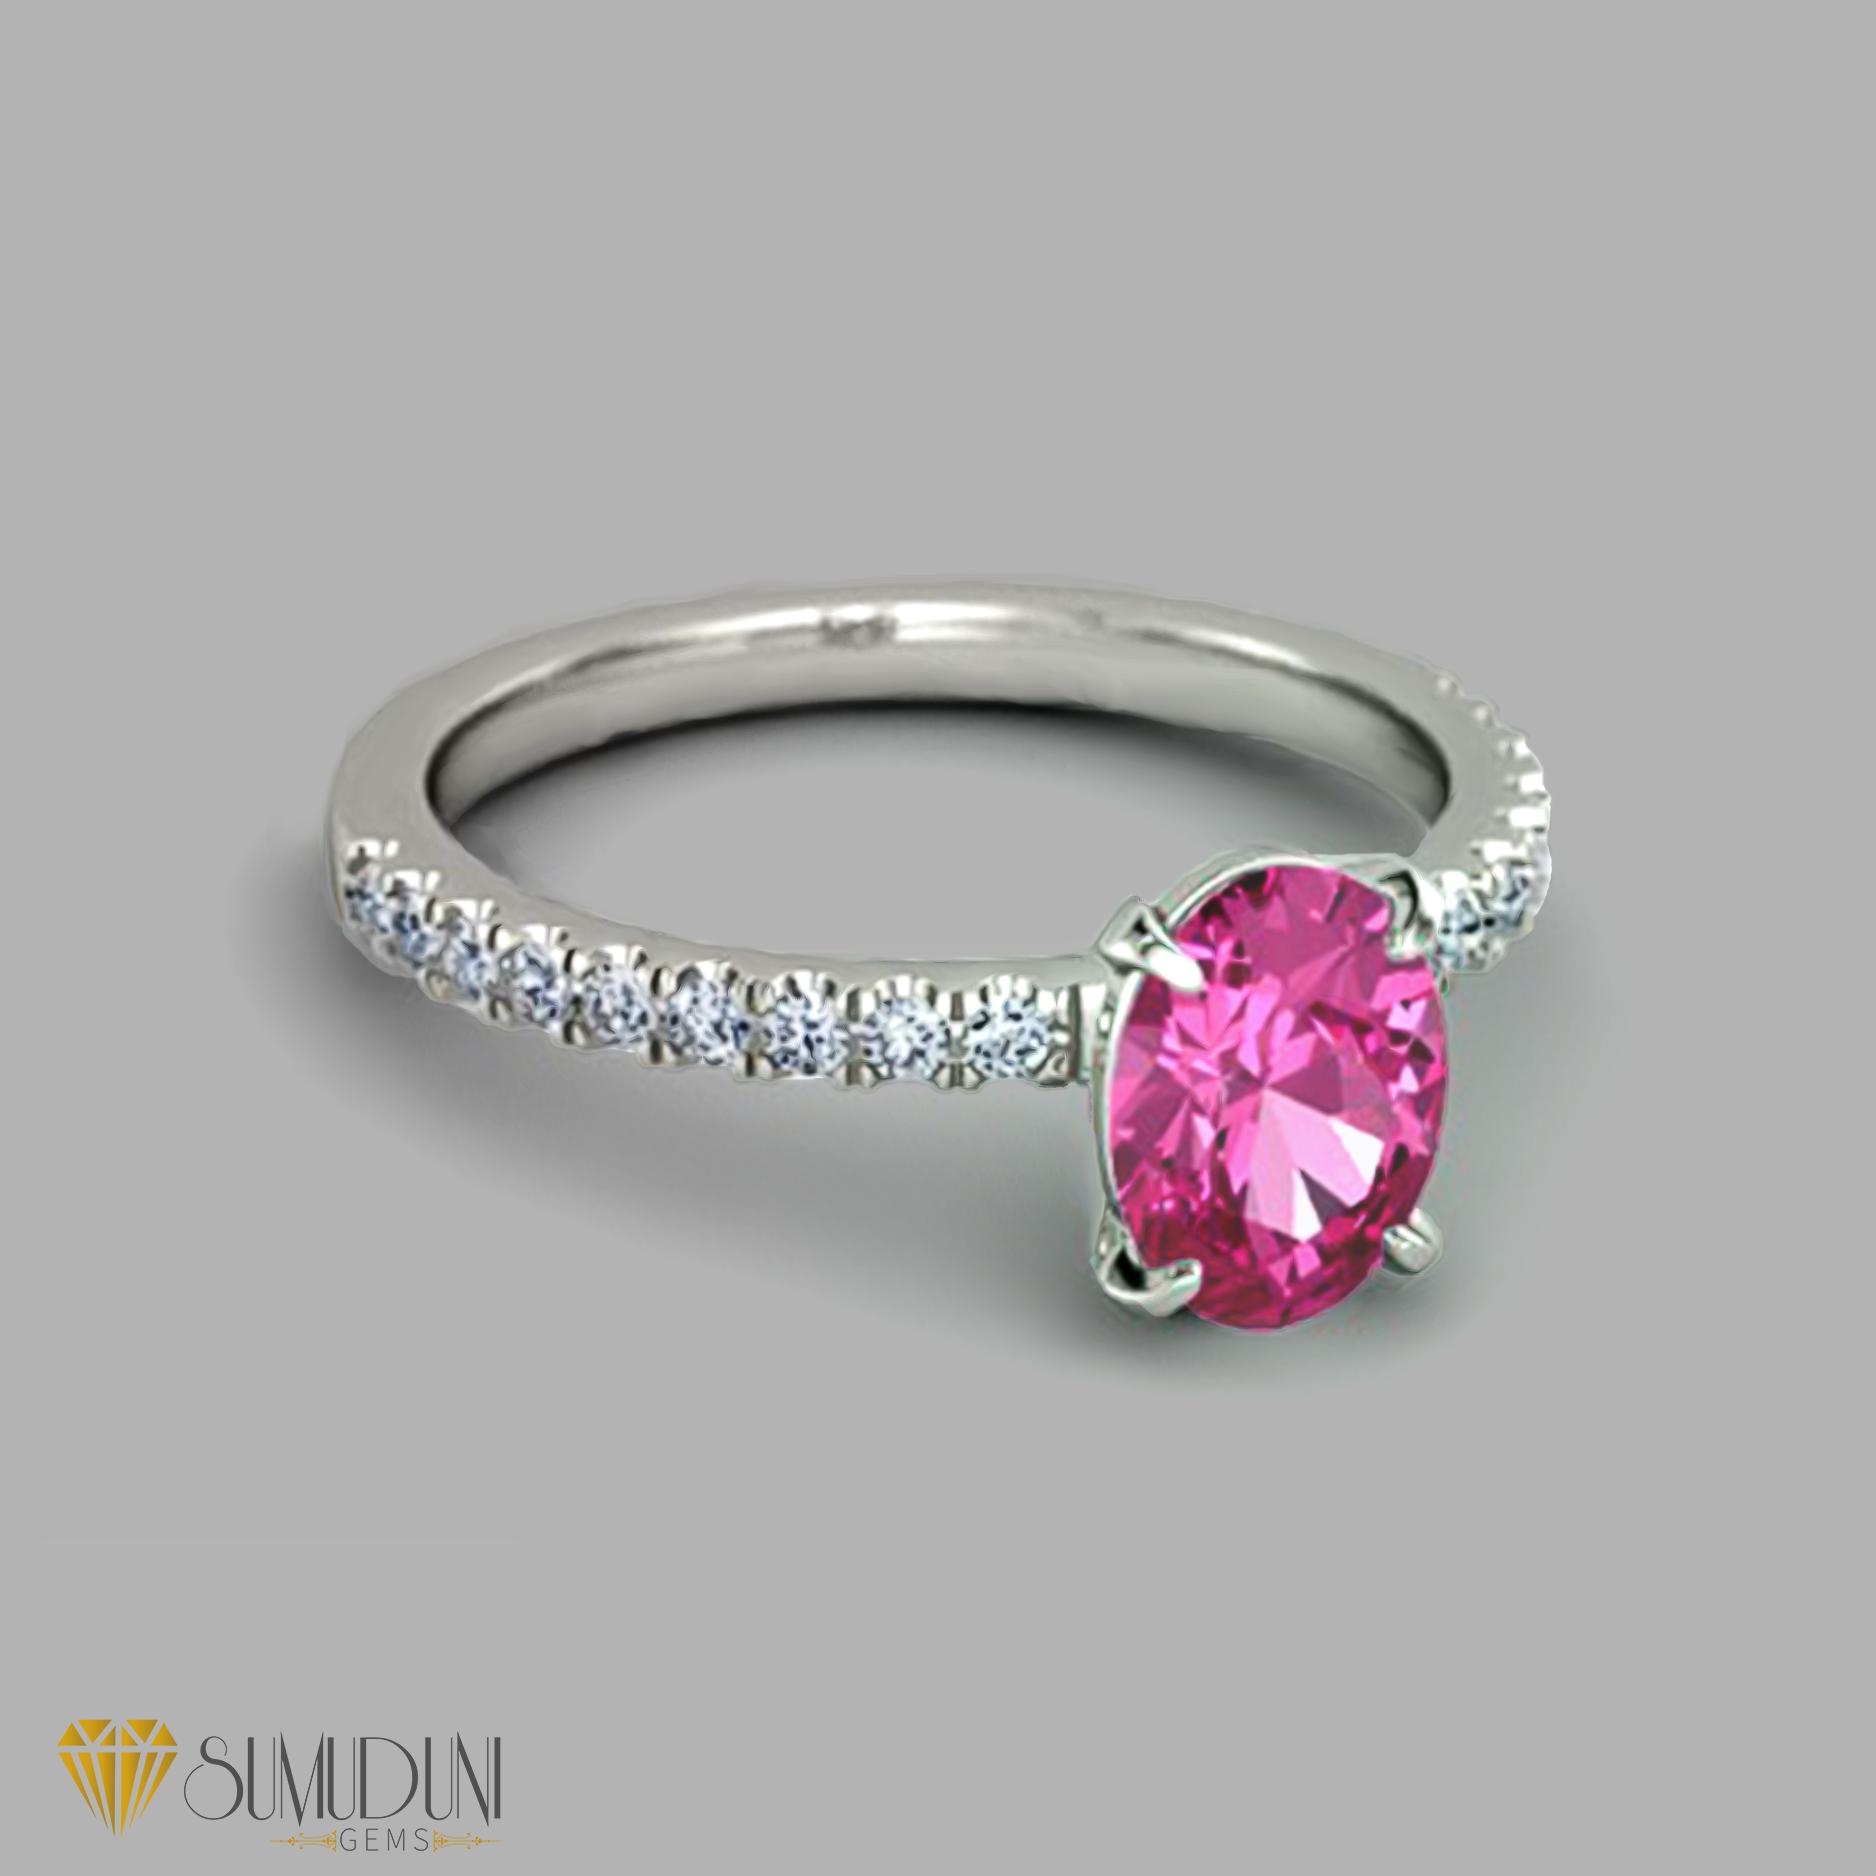 pink sapphire engagement ring |sumuduni gems